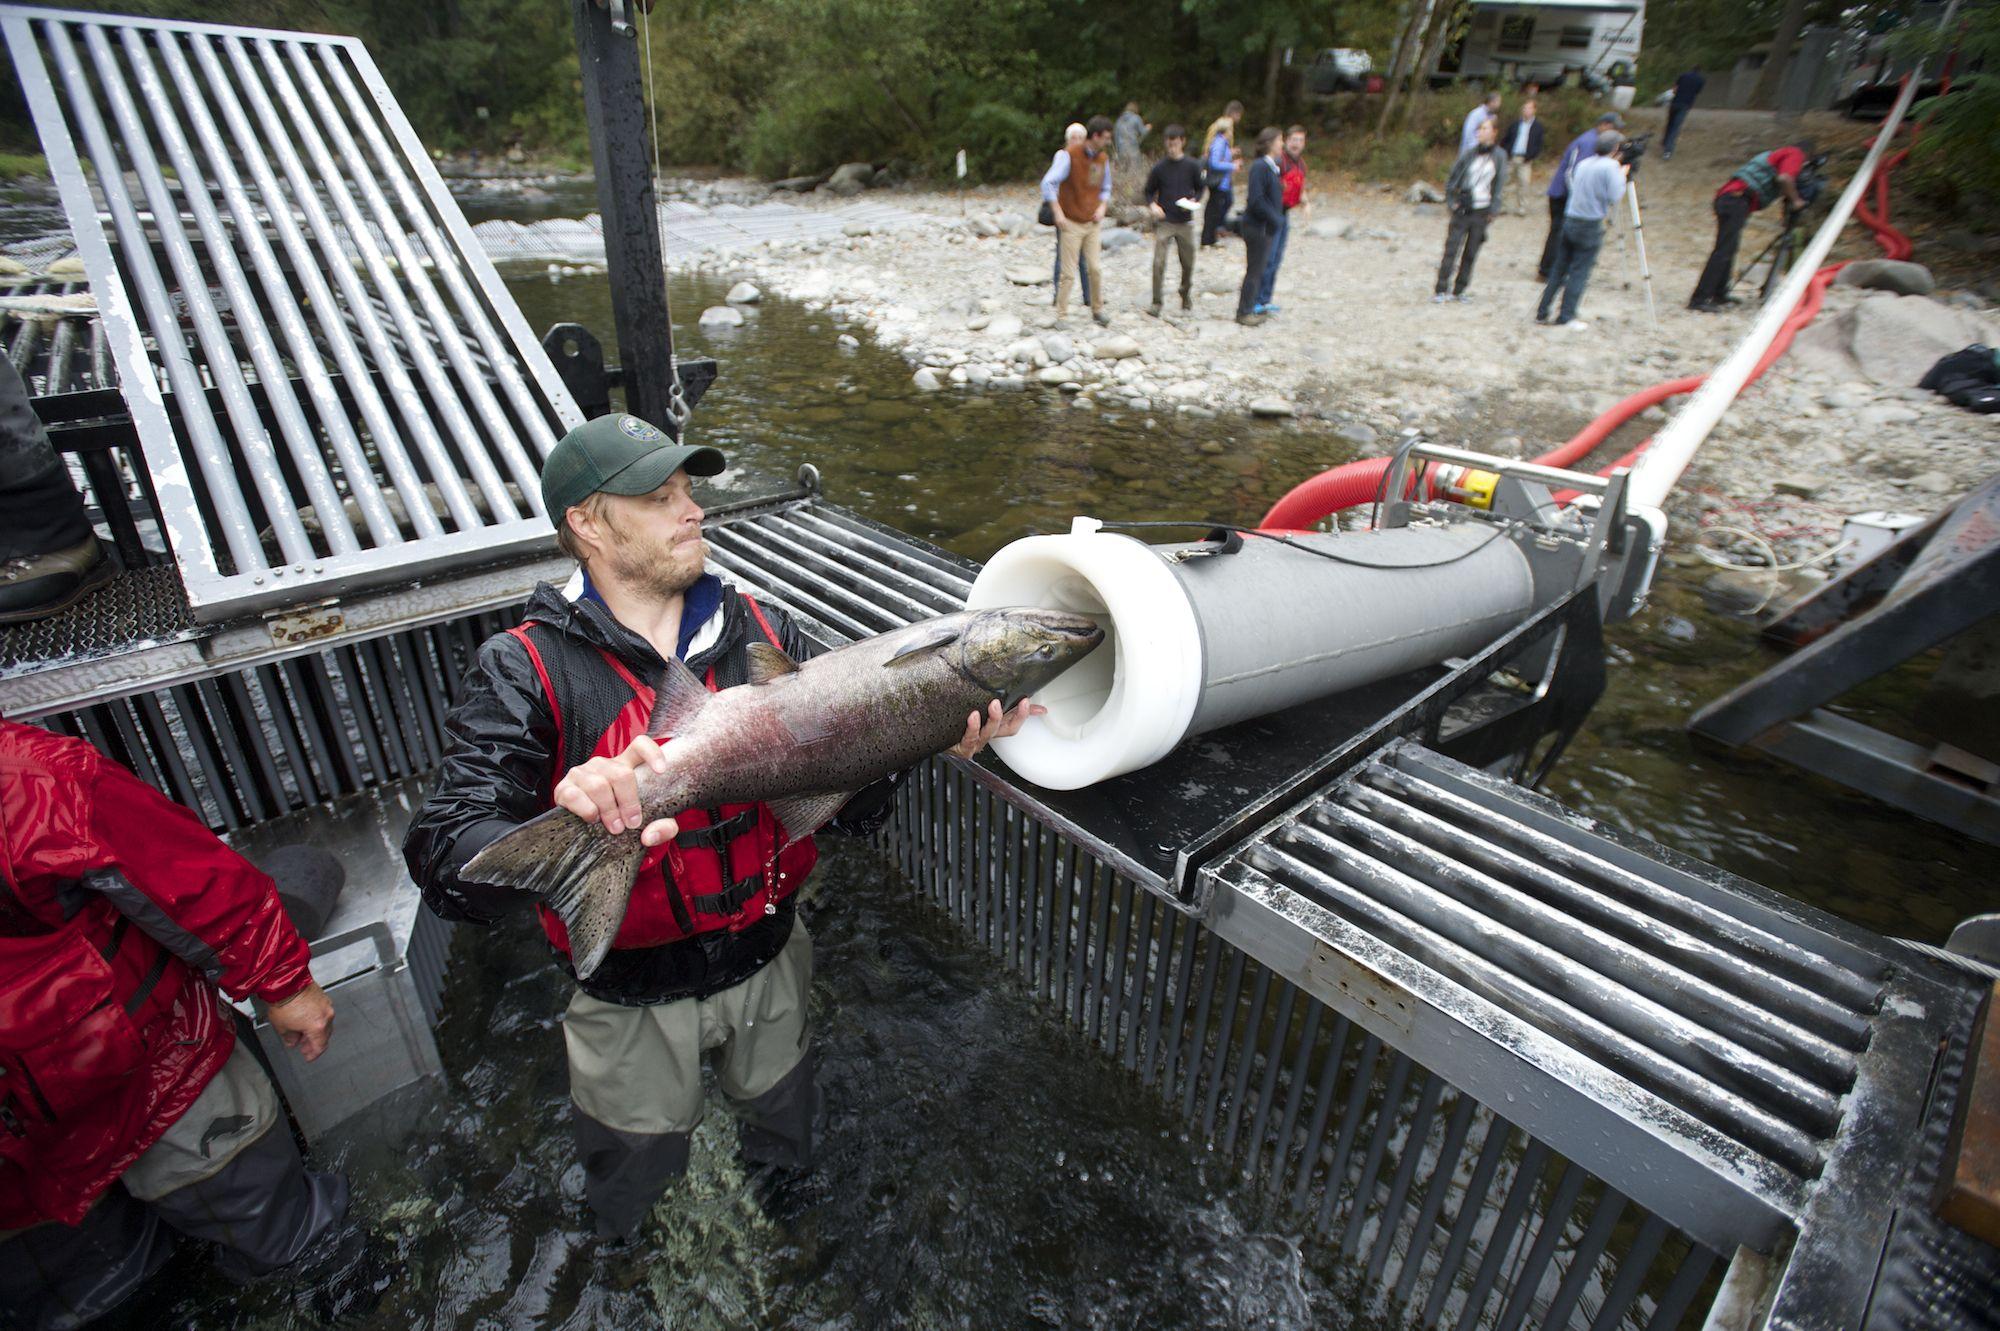 Baja California Sur: Pesca imposible en BCS… ¡capturan un salmón!(Excélsior)